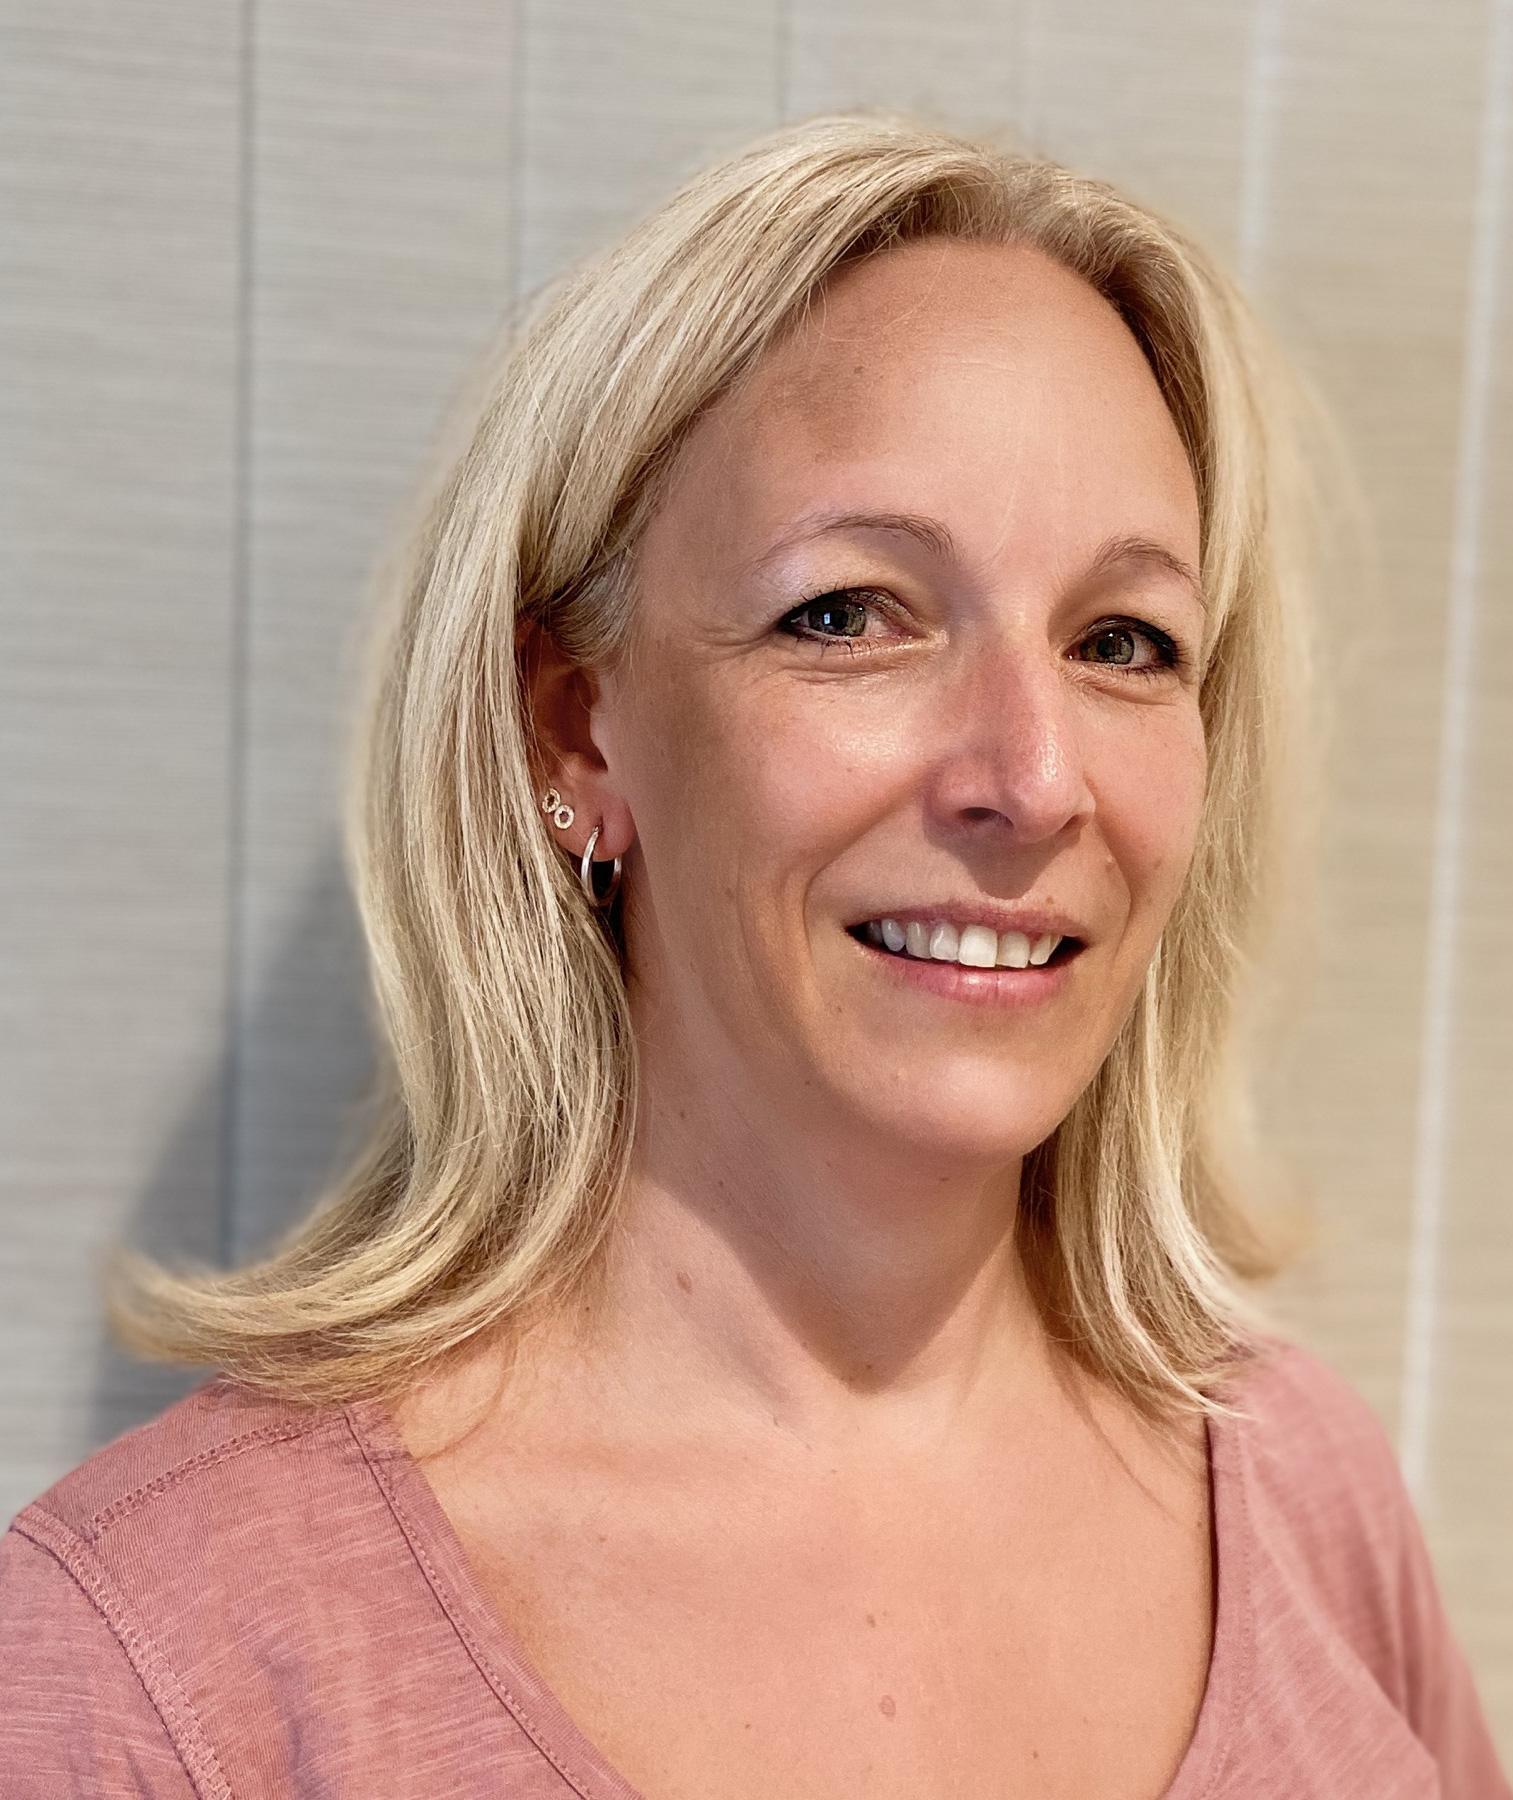 Tanja Roesebeck